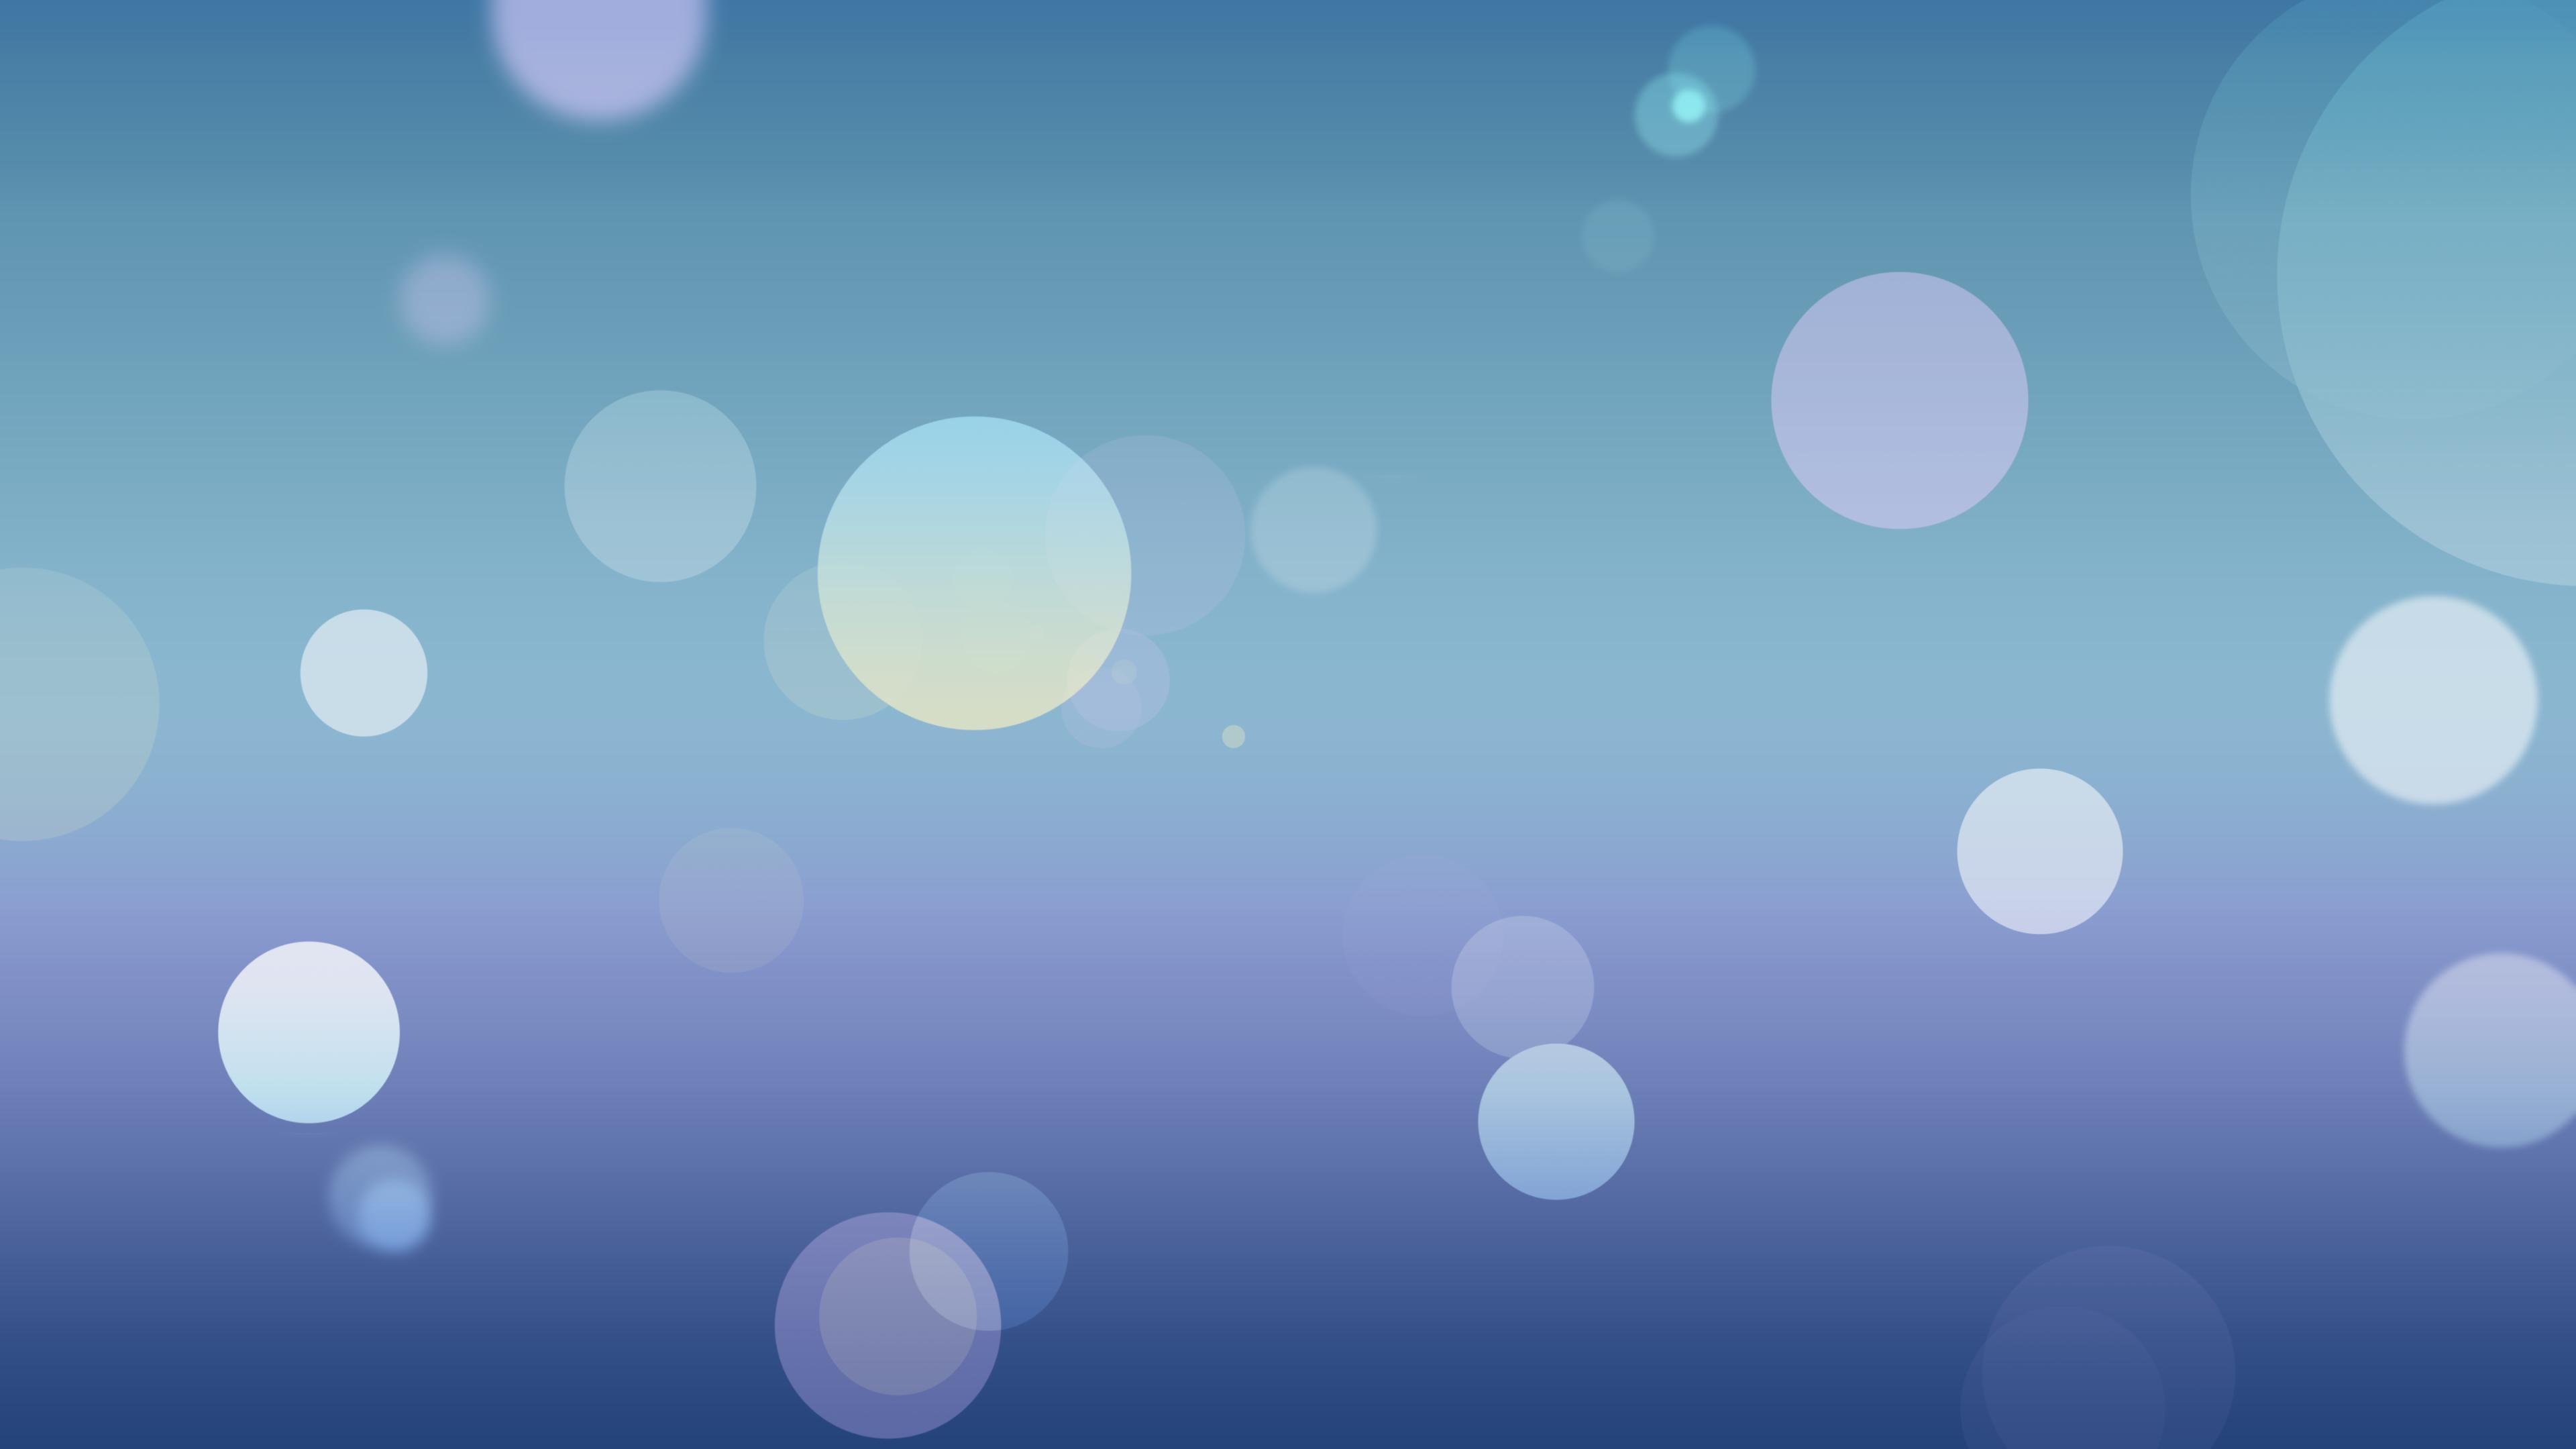 47+] Custom Dynamic Wallpaper iOS 7 on WallpaperSafari